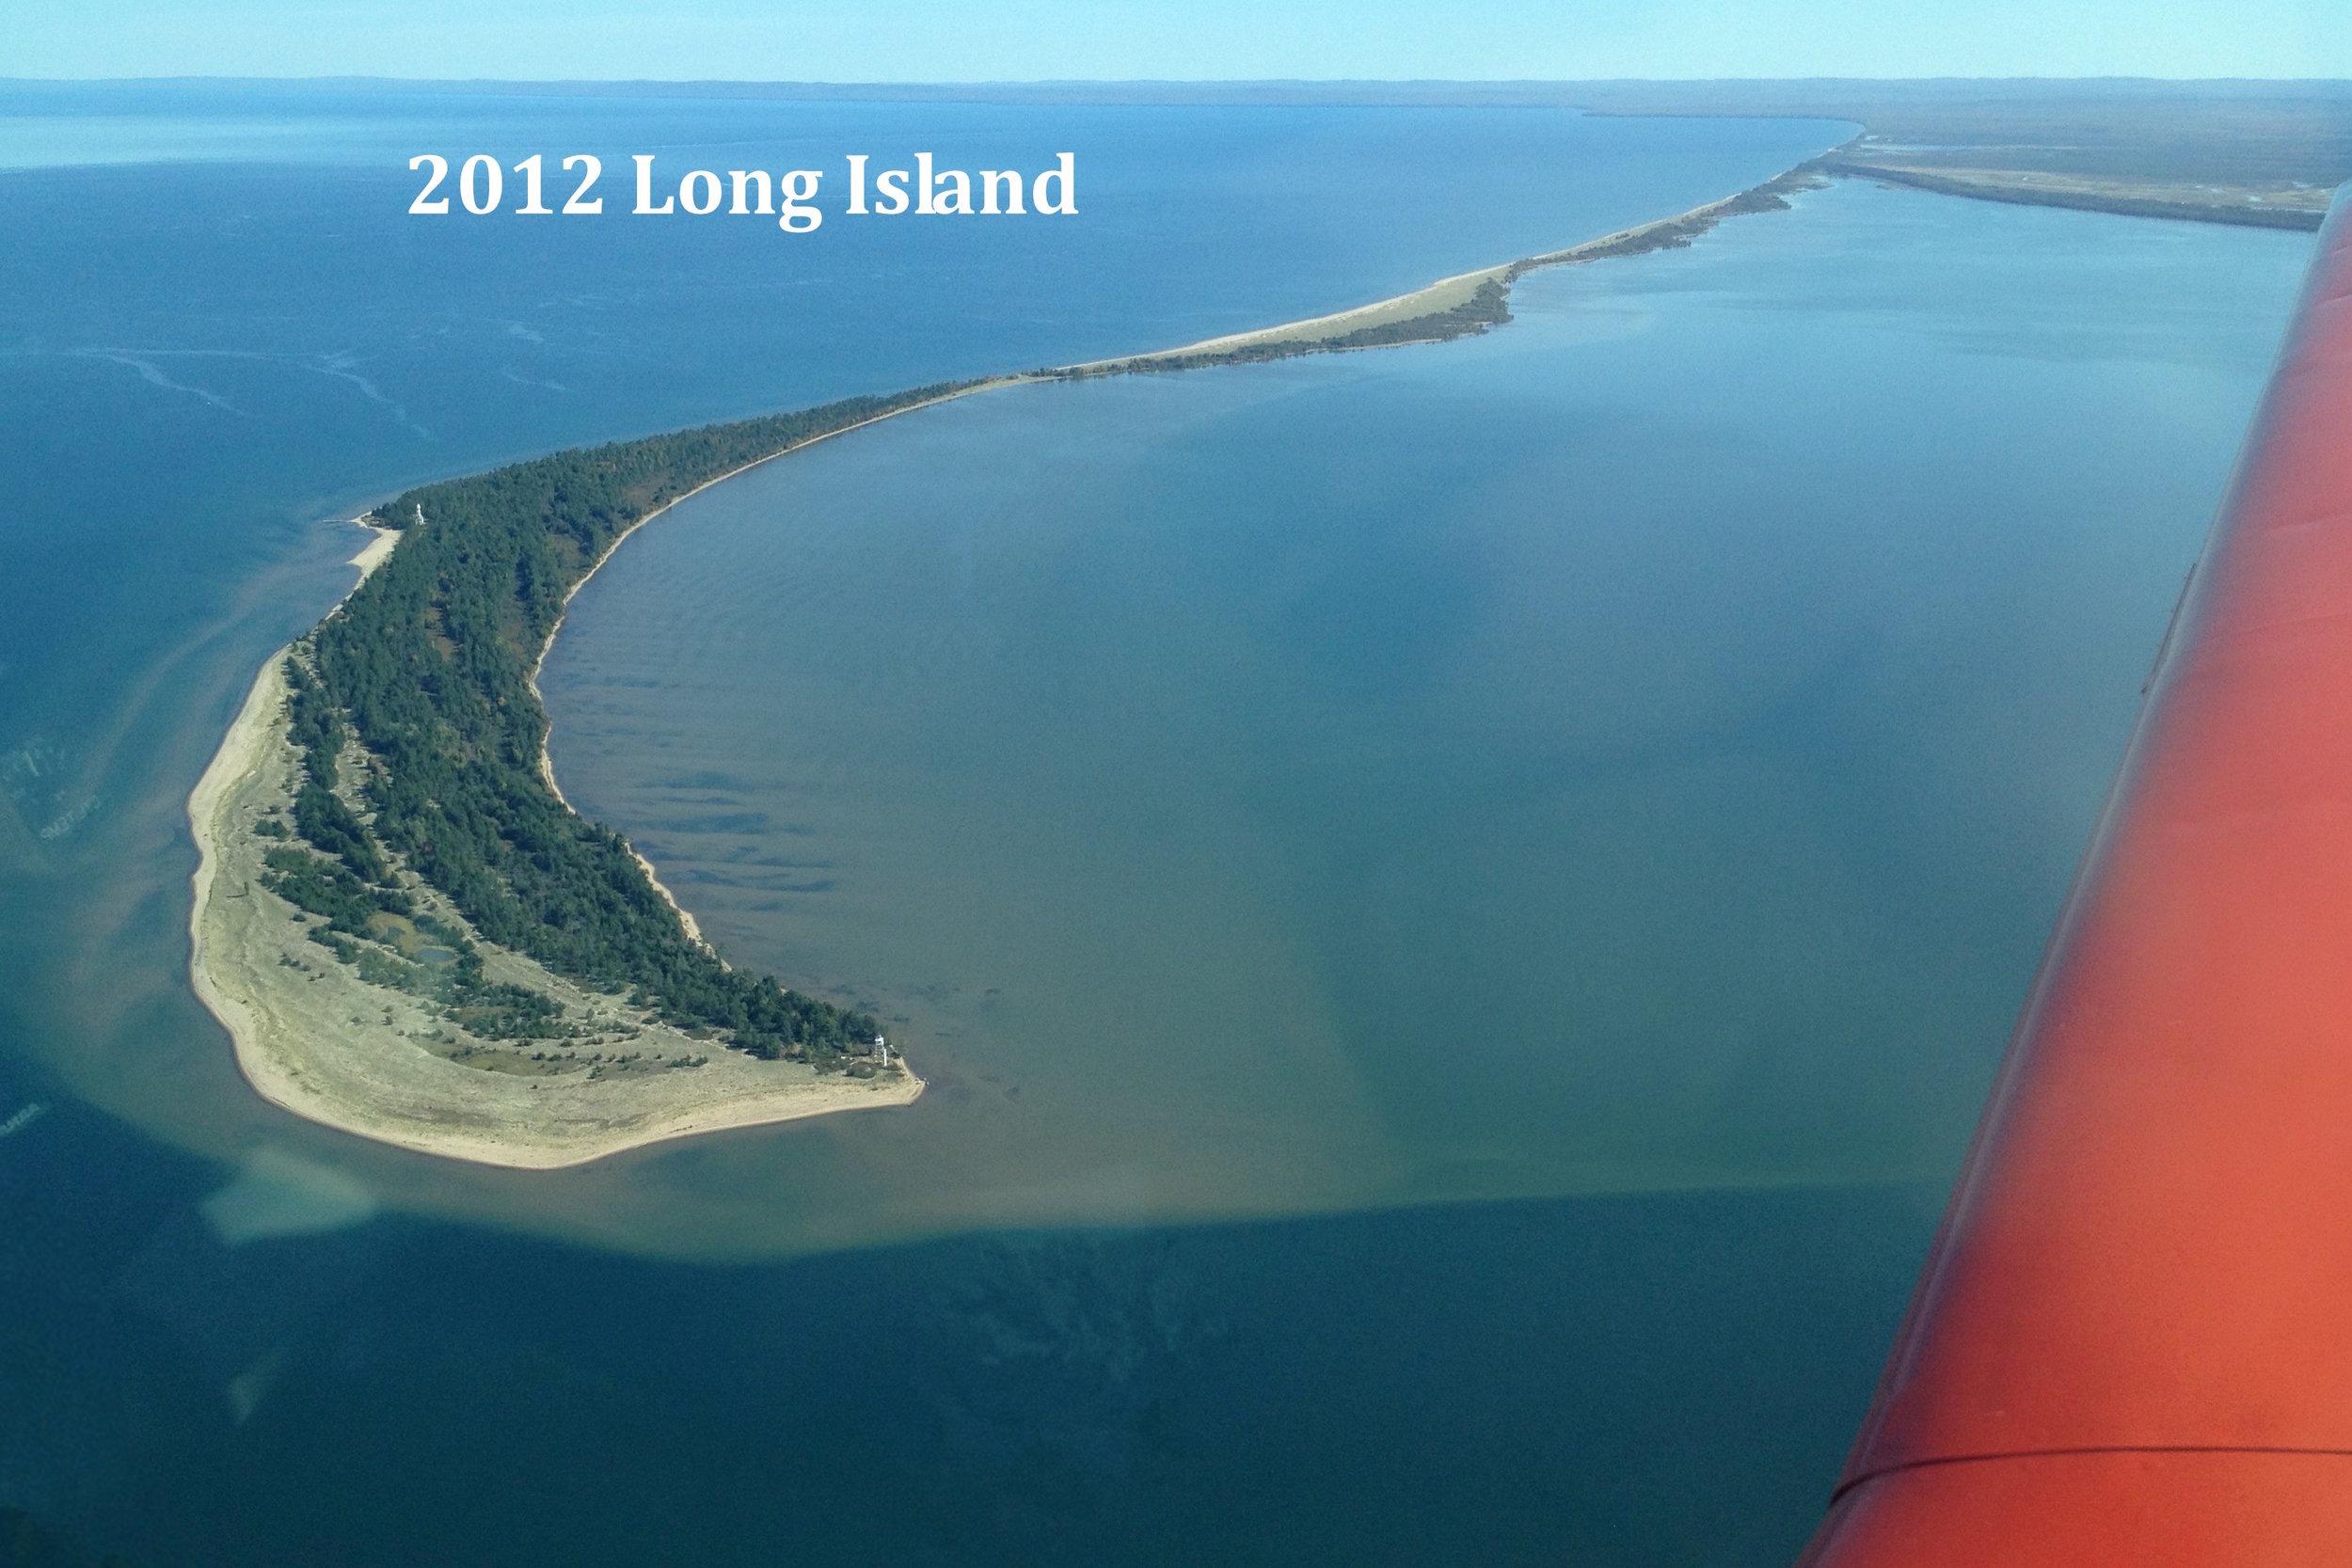 2012 Long Island.jpg